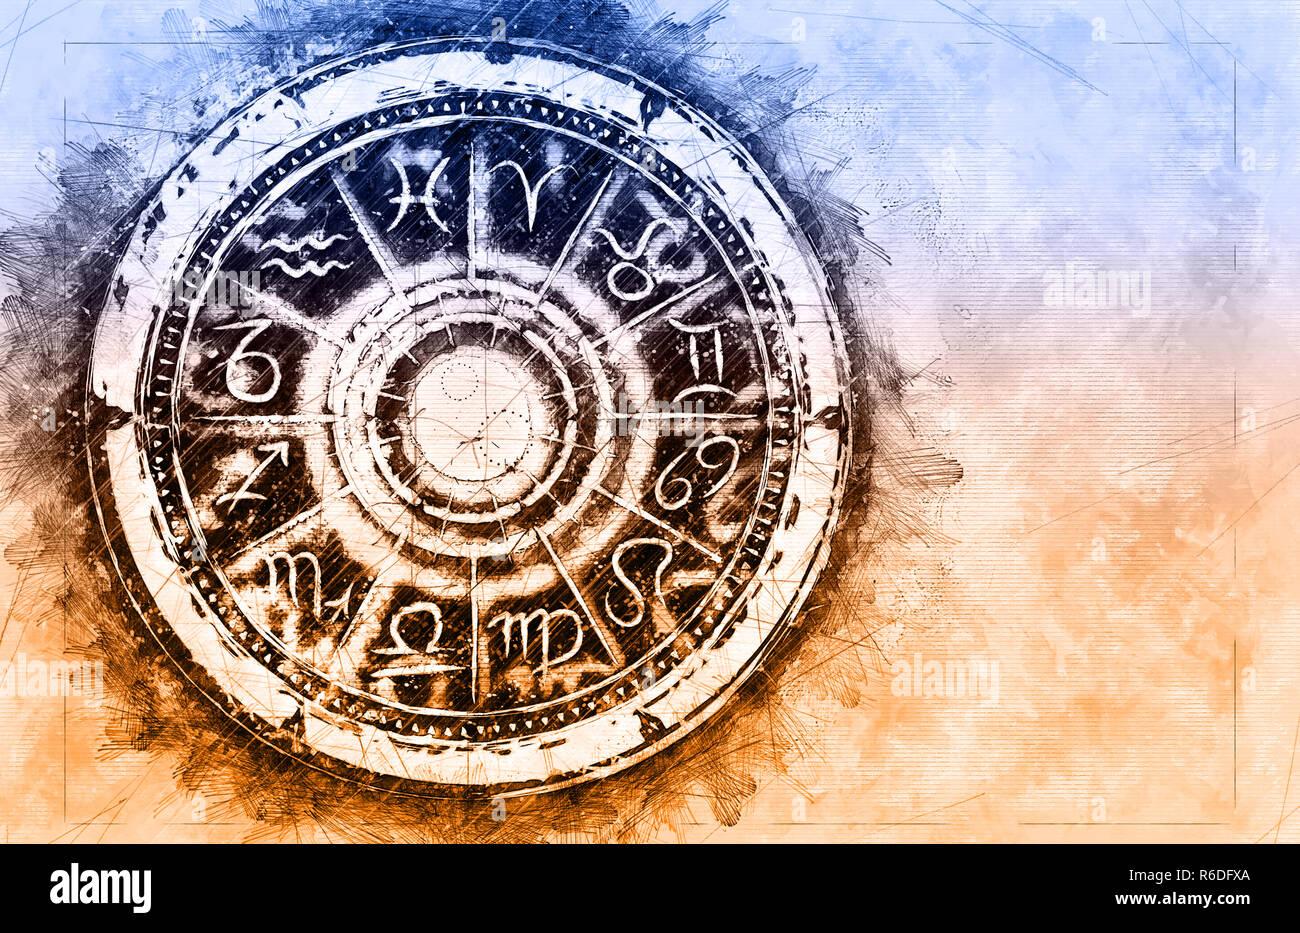 Zodiac sign horoscope cirlce on grunge background. Creative Astronomy Symbol concept - Stock Image